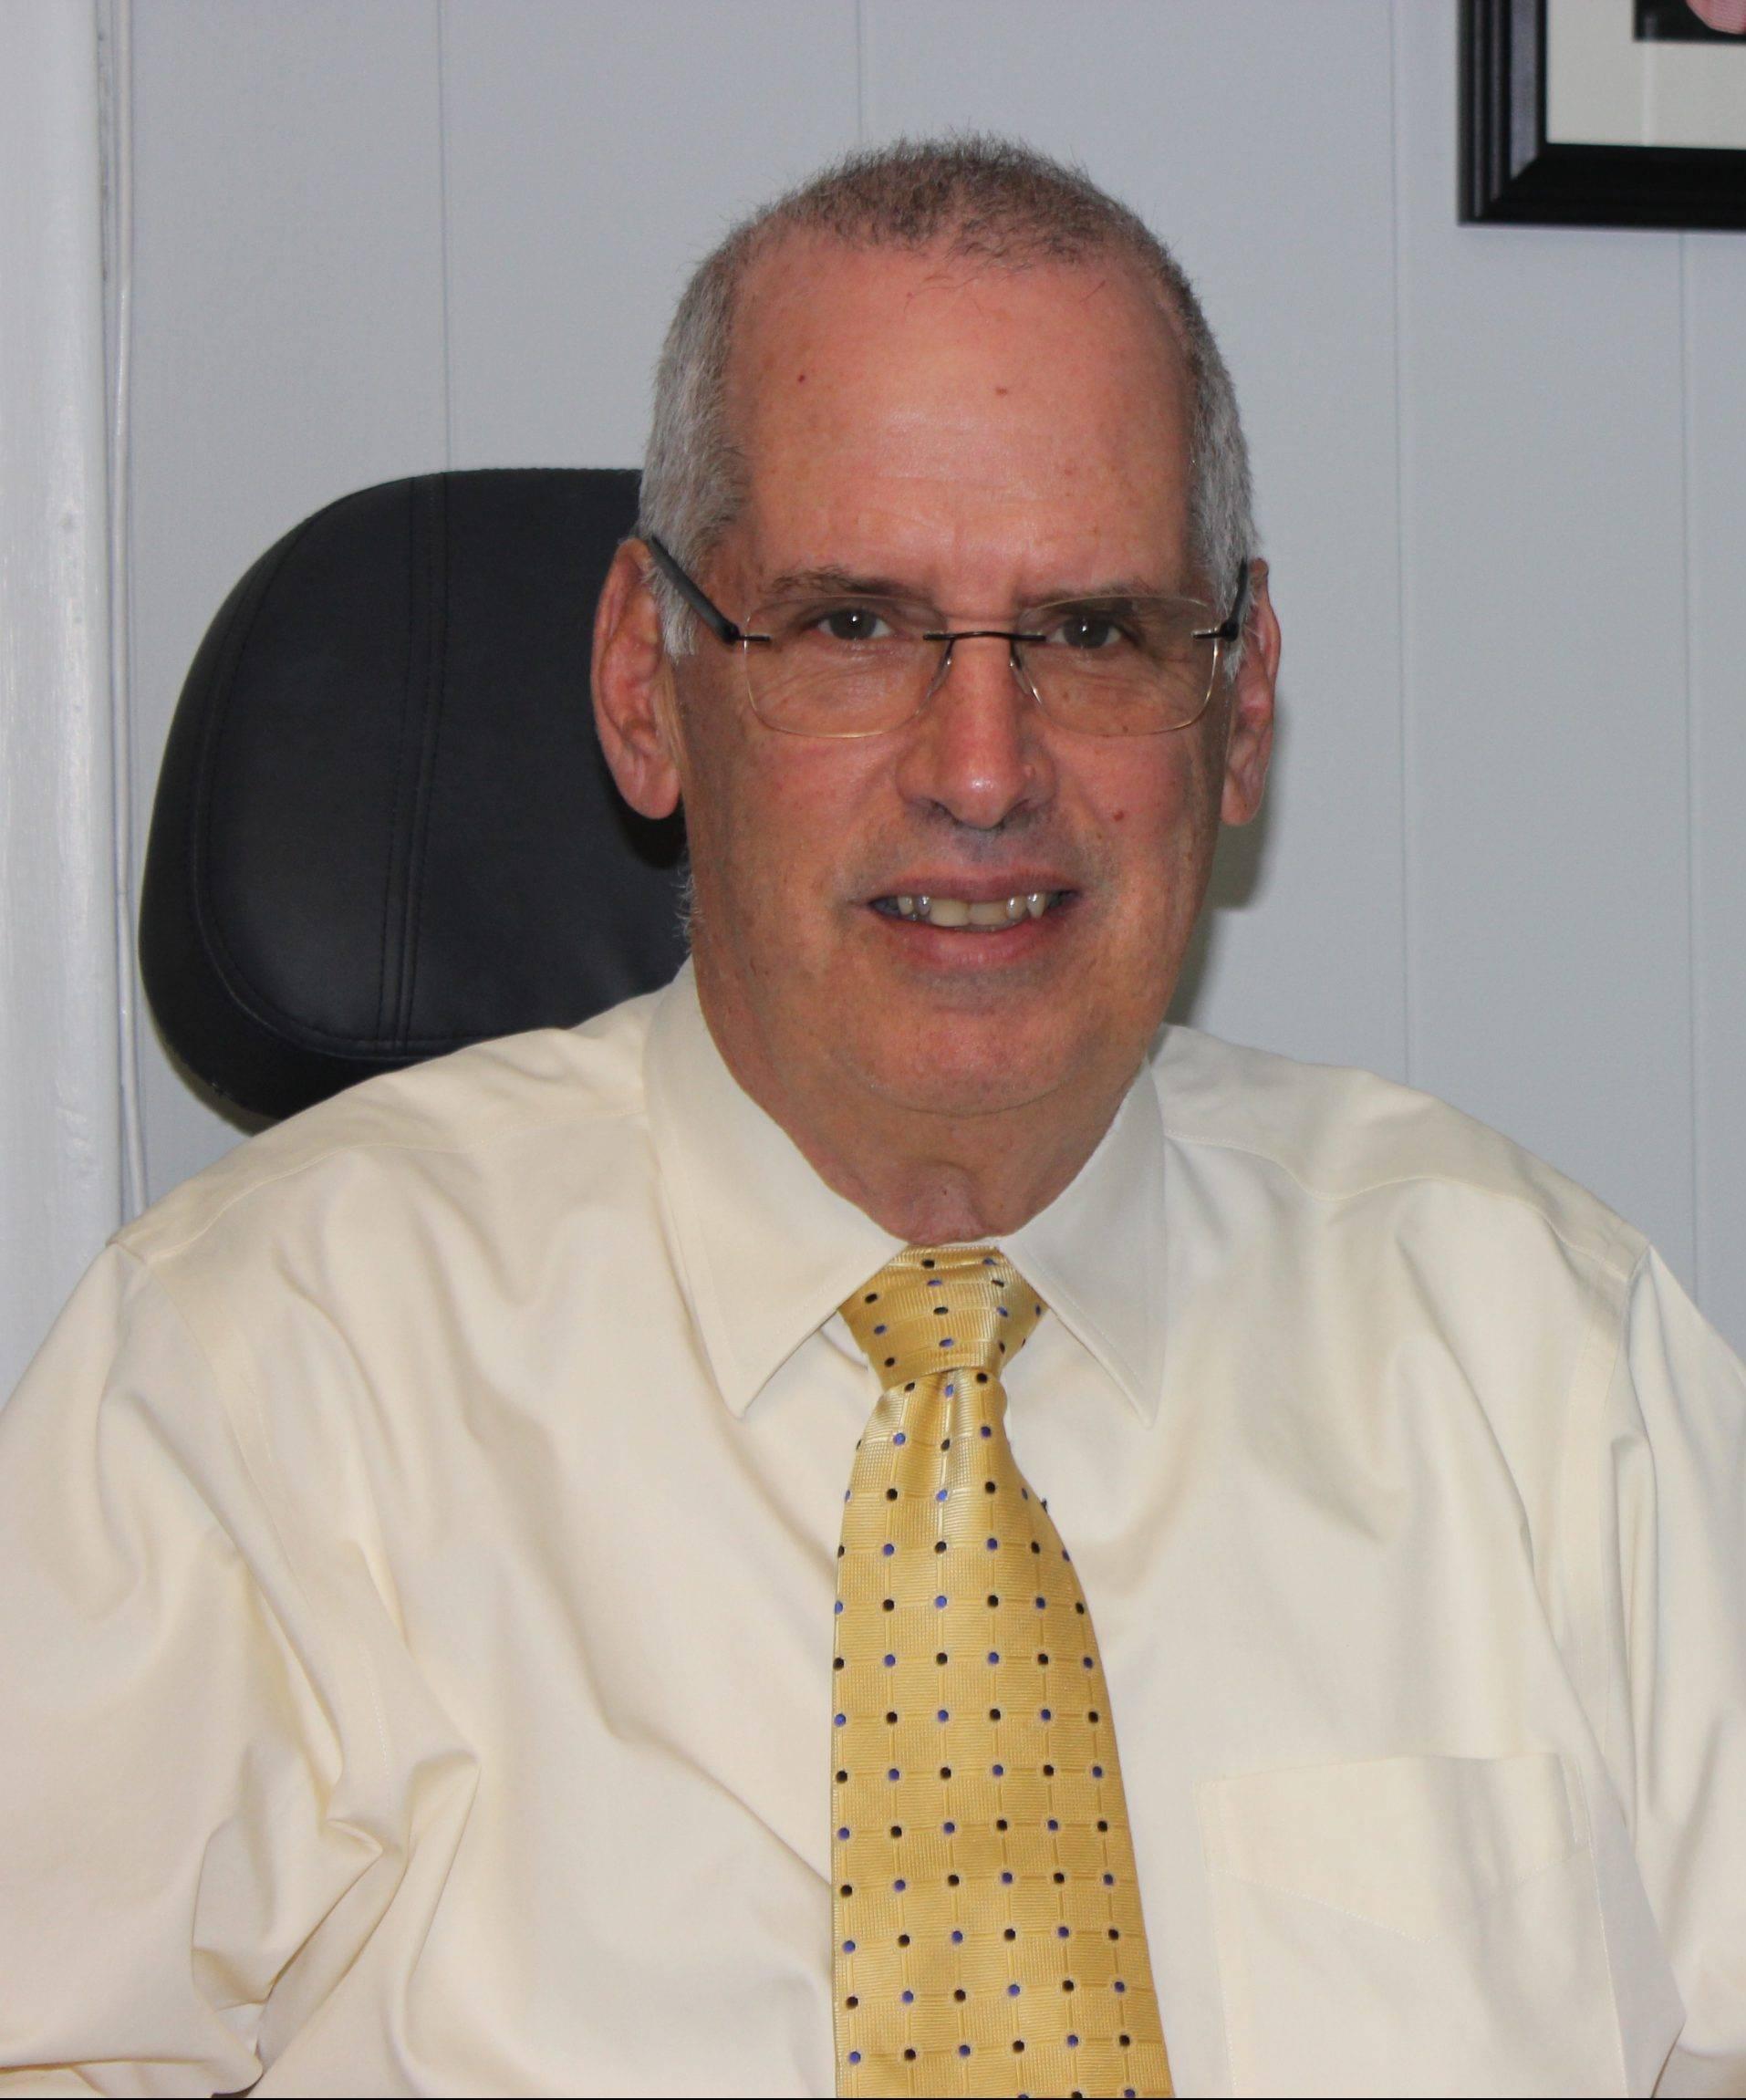 Dr-Cohen-IMG_0527-1-e1483646462213